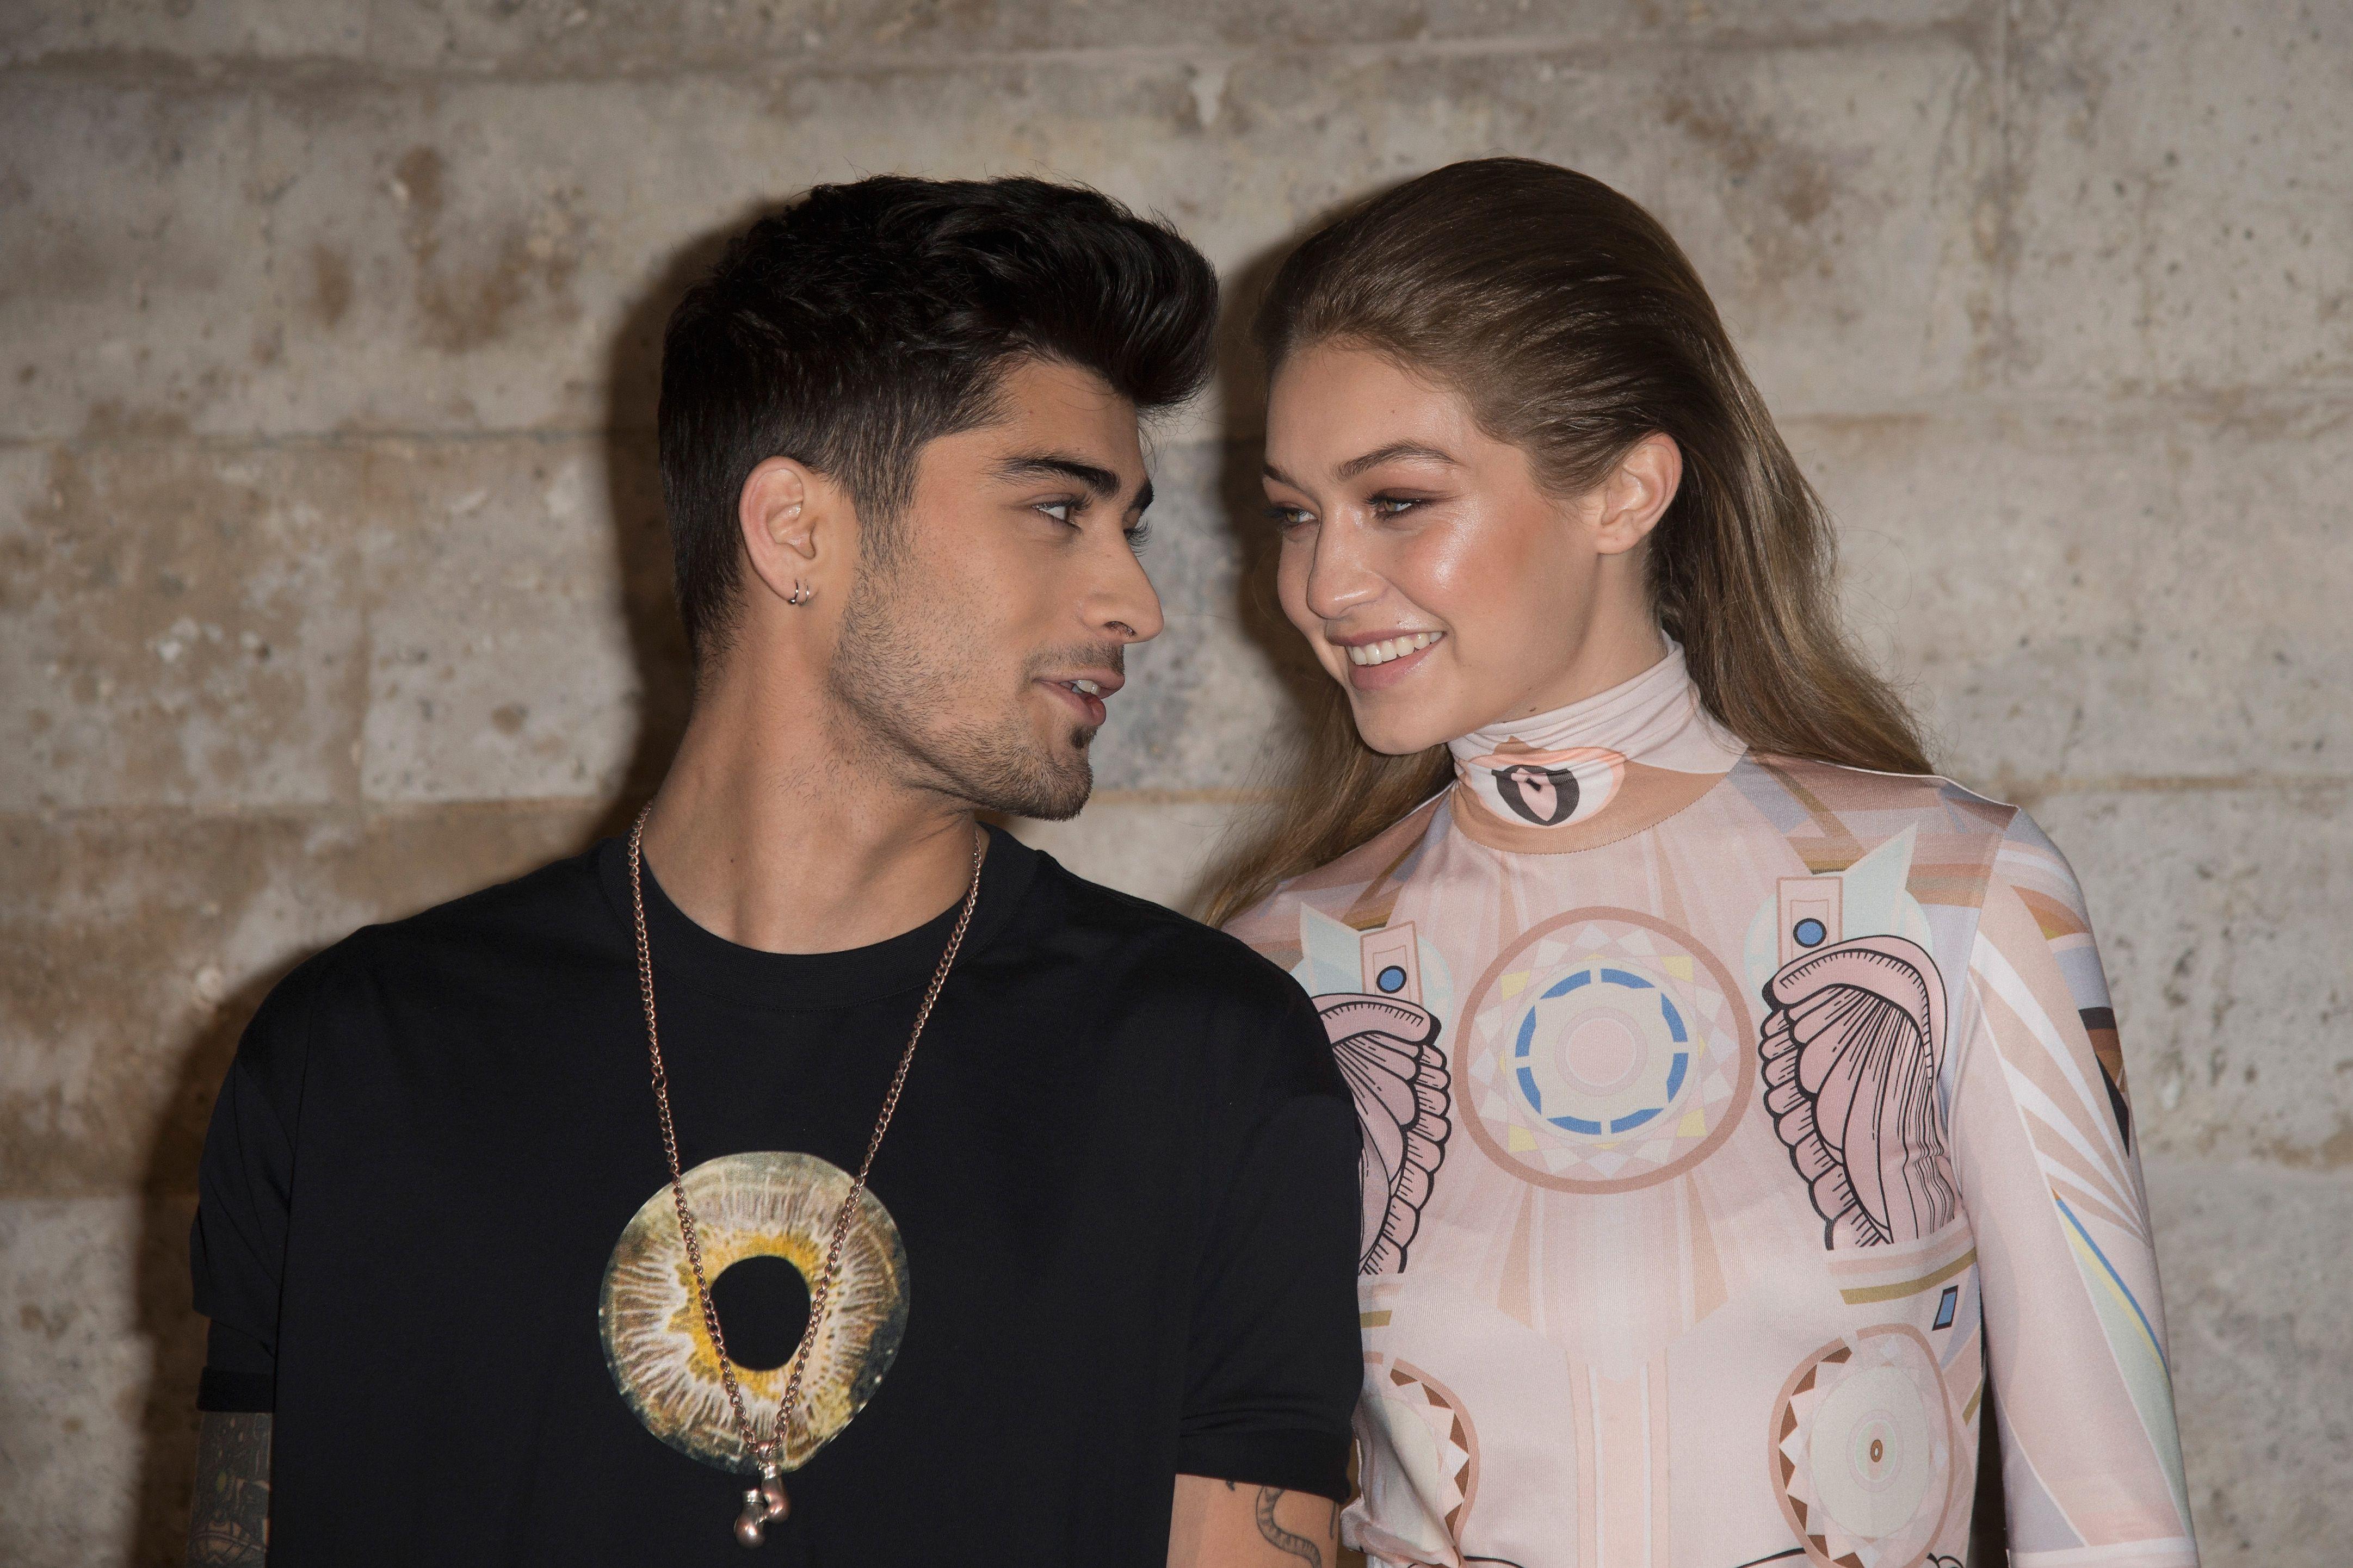 Gigi Hadid Went Instagram Official With Zayn Malik Again for Valentine's Day